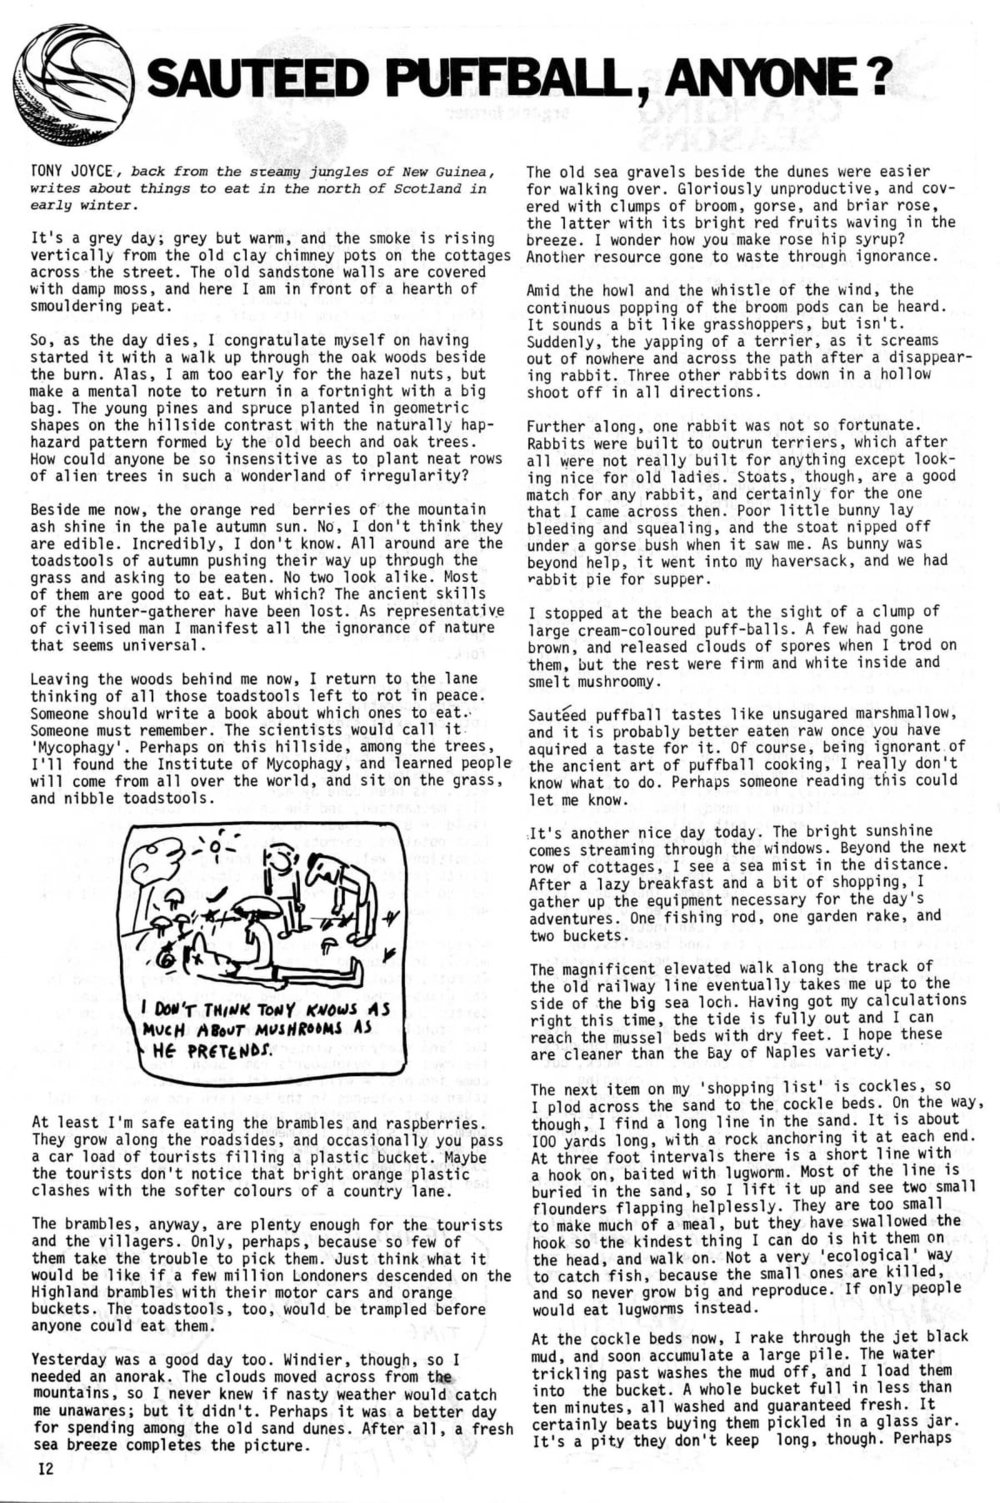 seed-v2-n10-oct1973-12.jpg